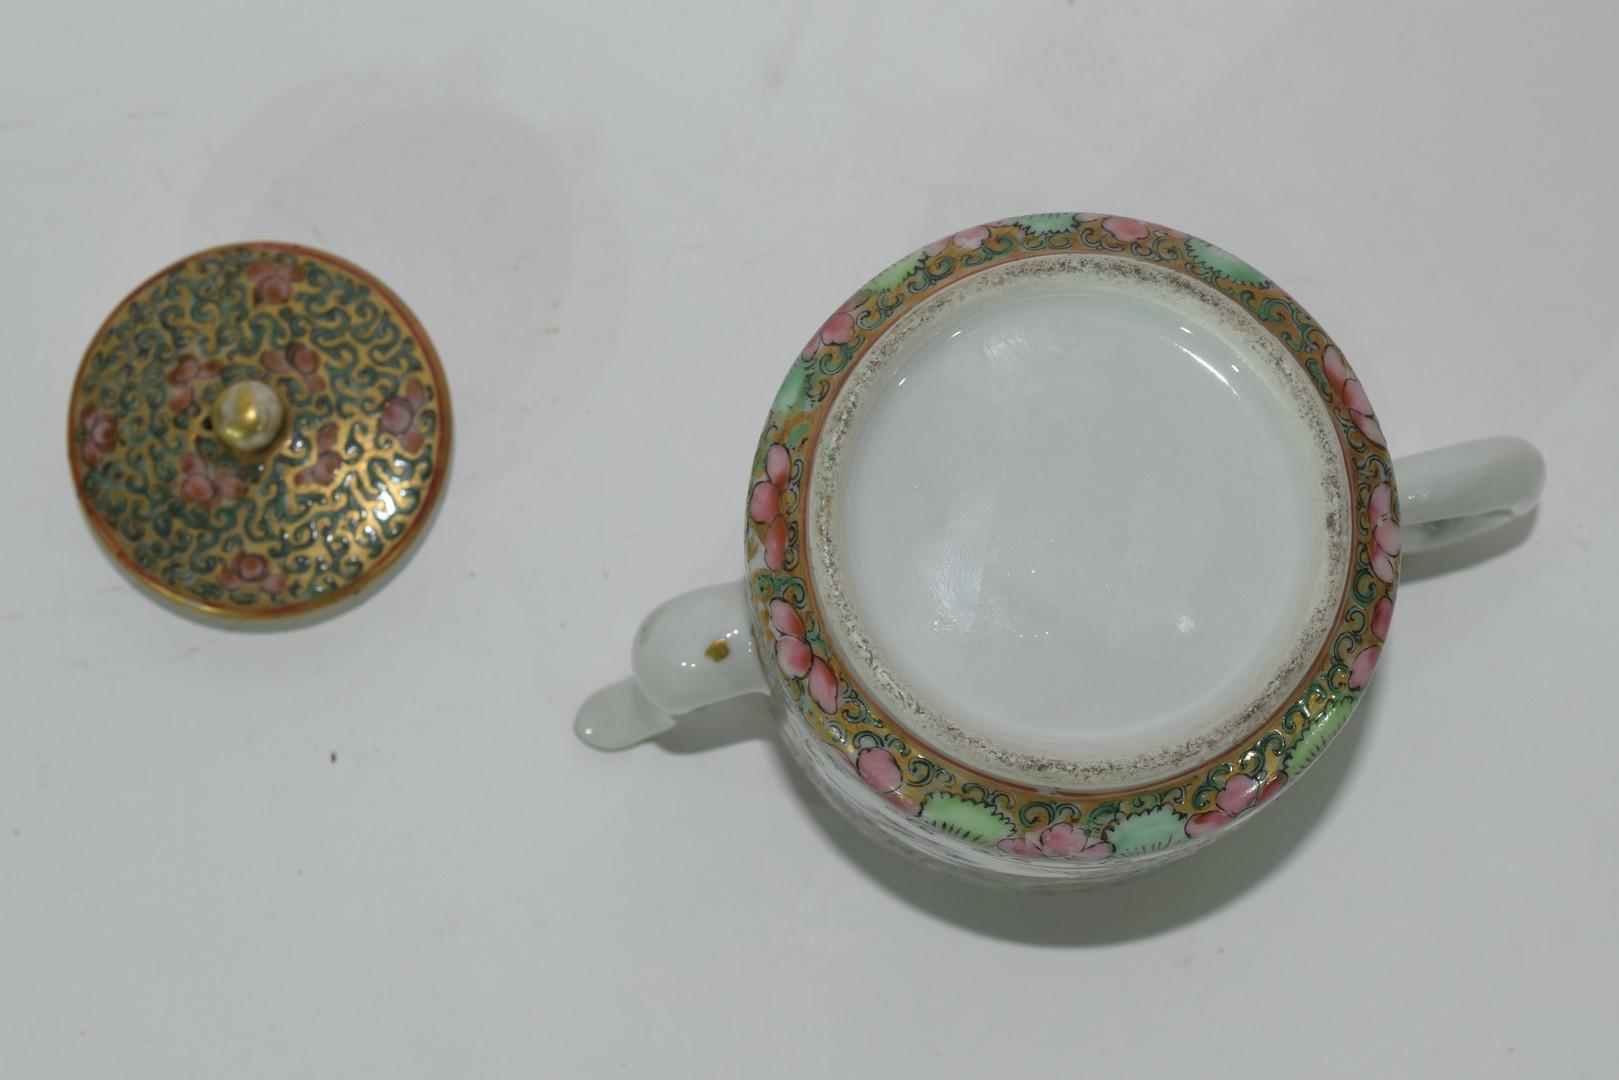 Small Cantonese porcelain tea pot - Image 7 of 7